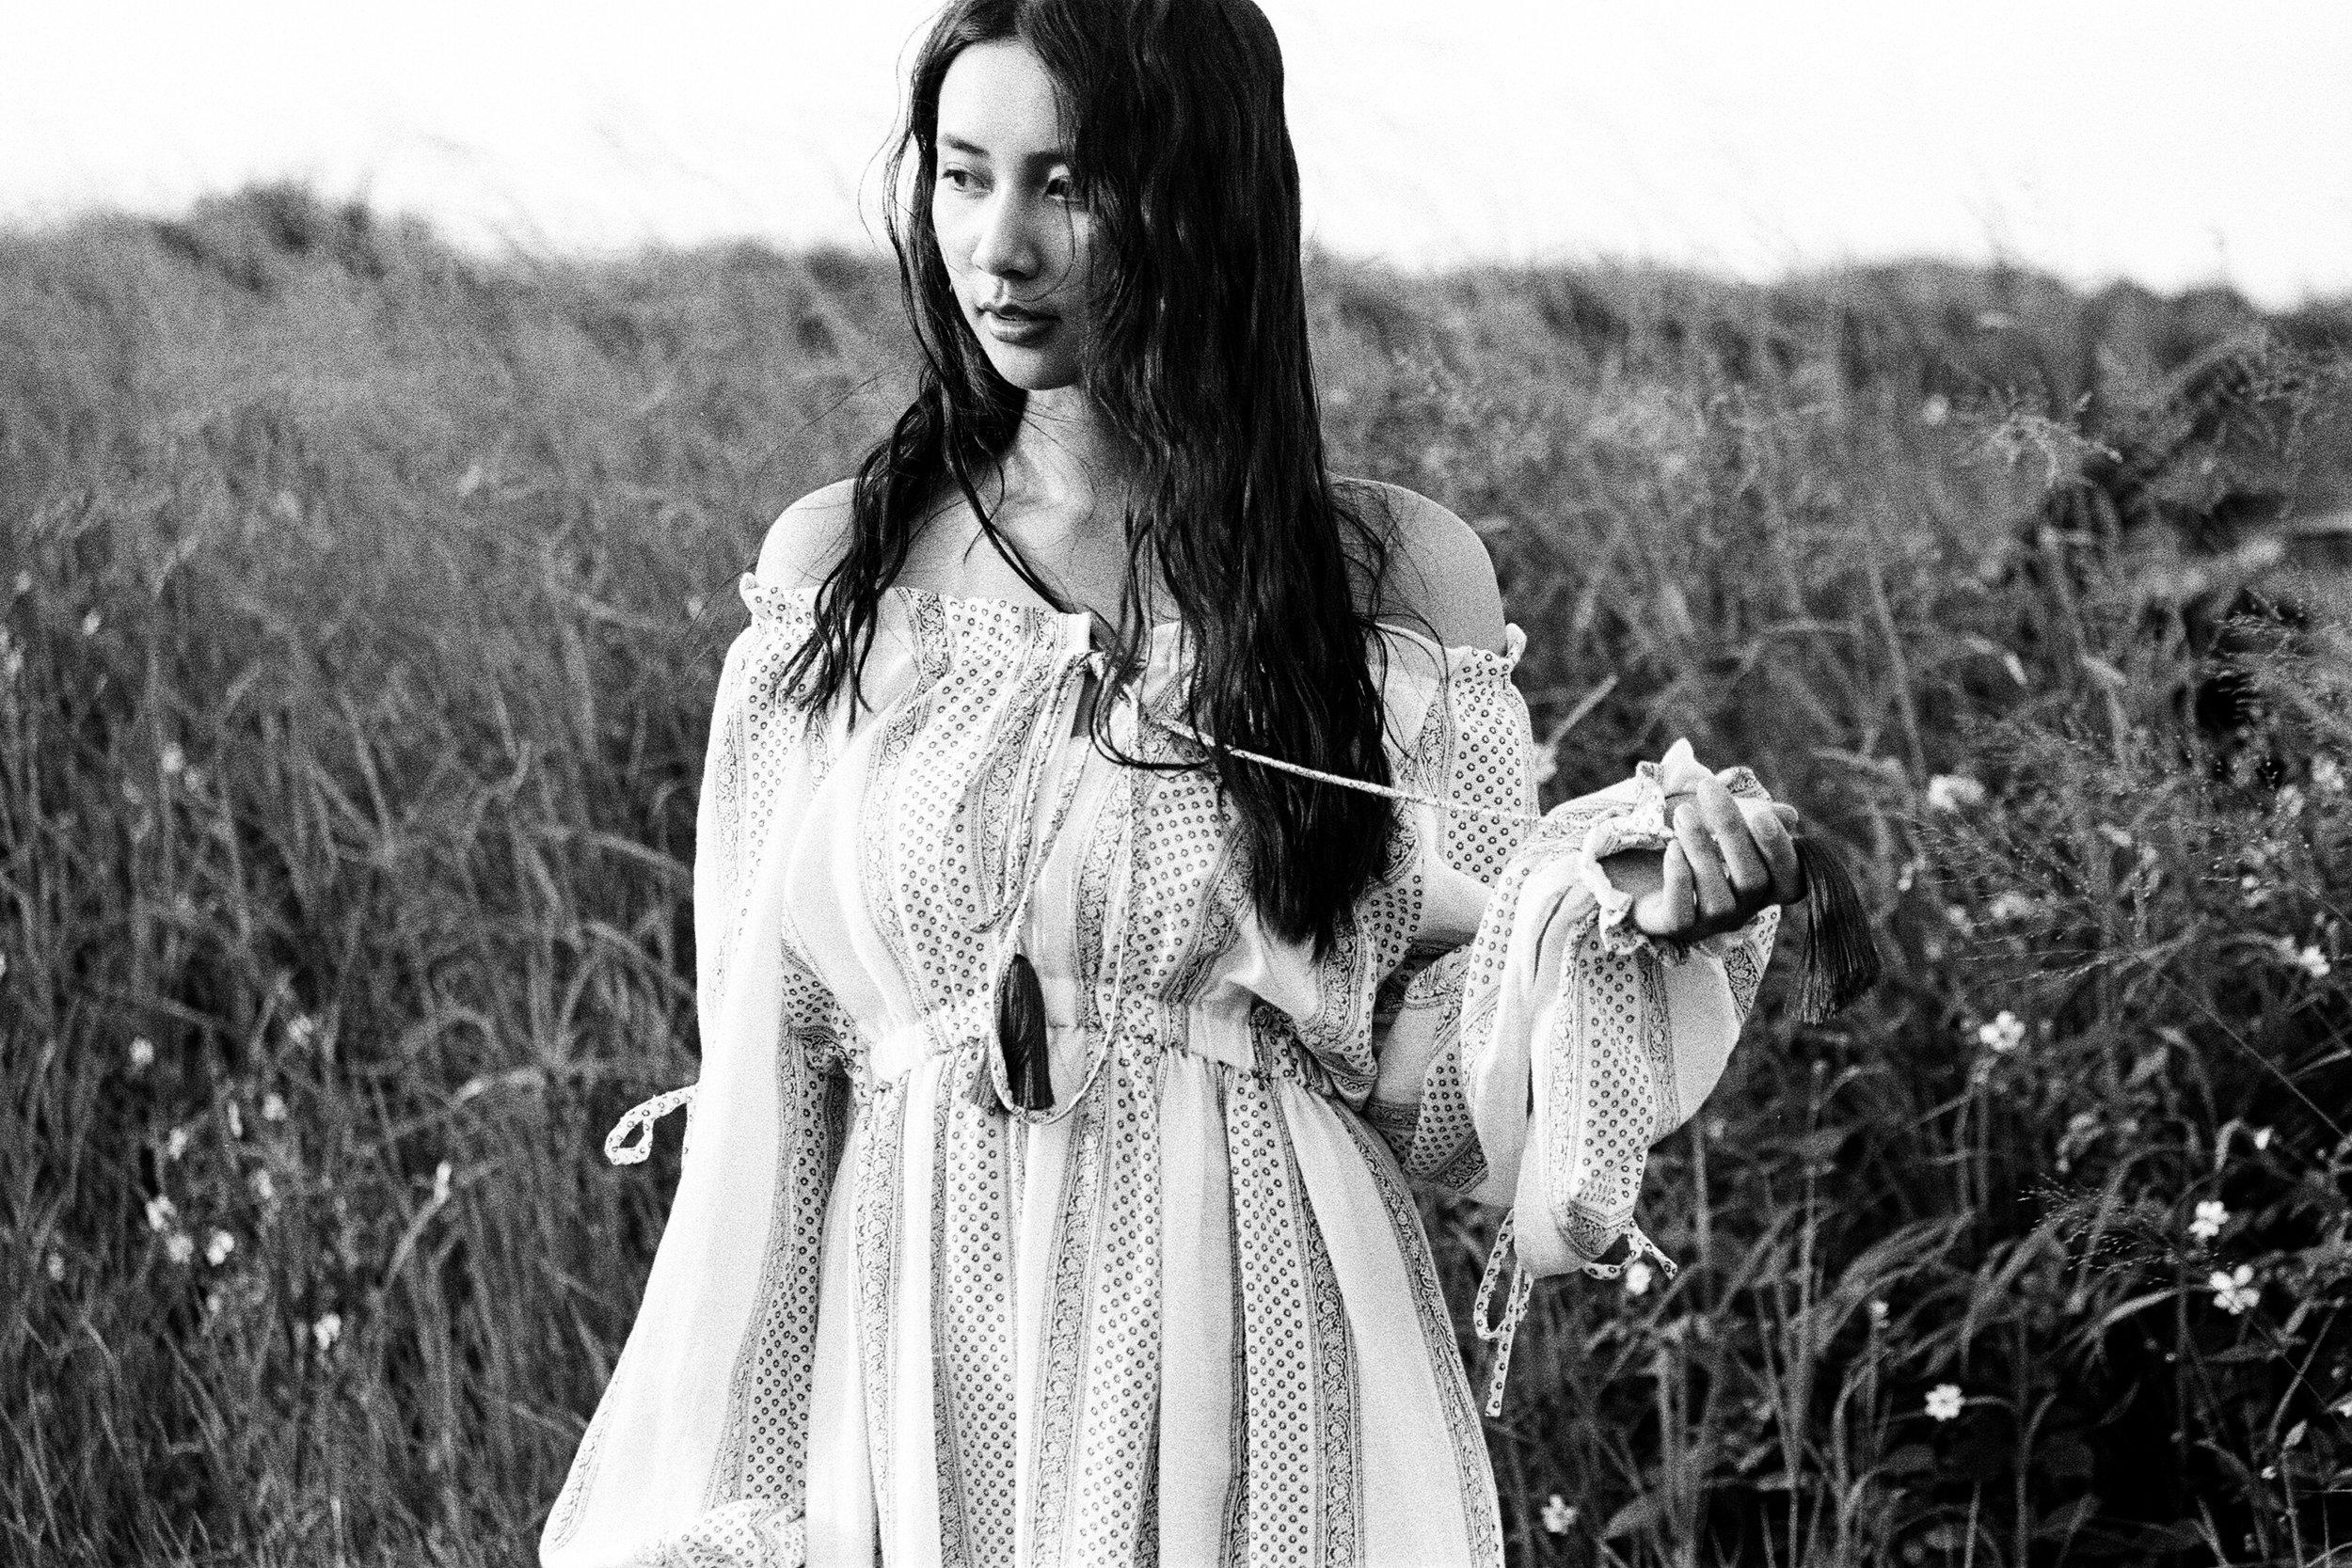 portrait-jane-girl-寫真-許厝港-桃園-45.jpg